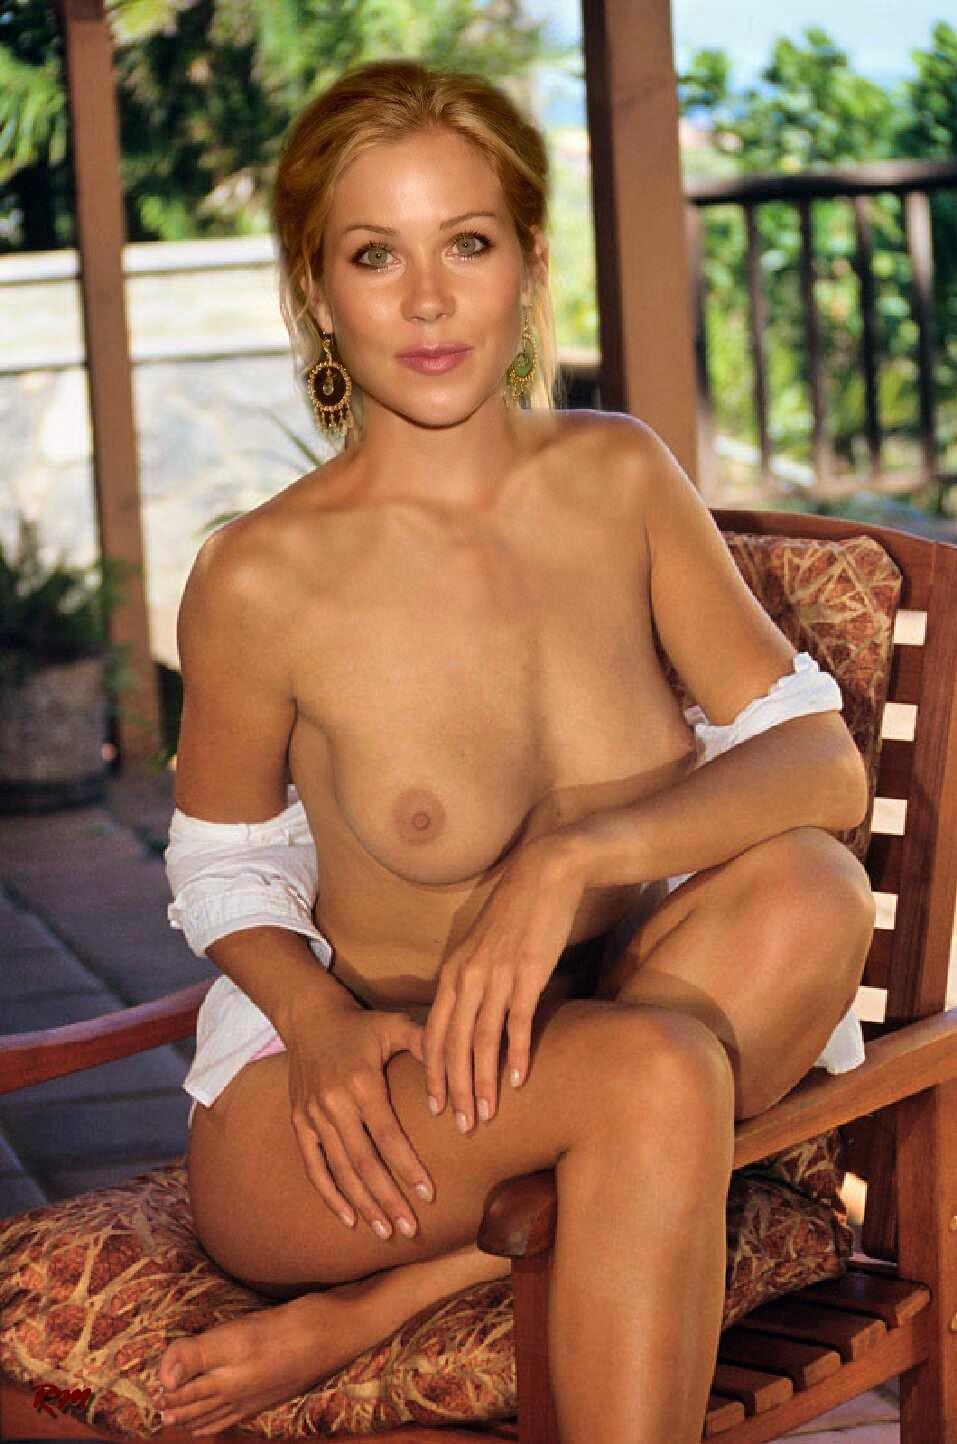 Nackt Bilder : Christina Applegate Nake Pictures   nackter arsch.com